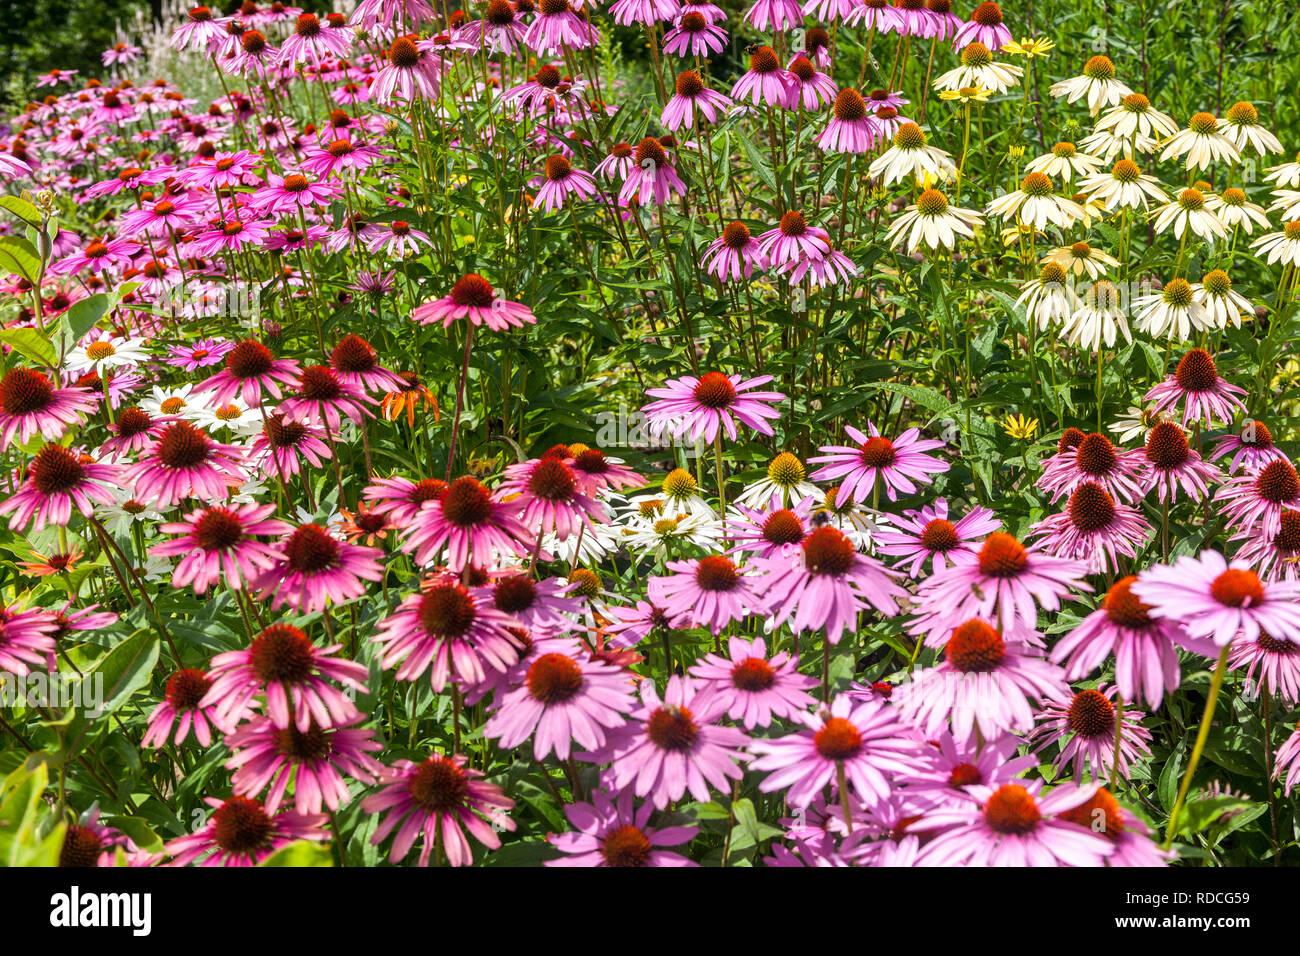 Perennial flowers border garden plant, Echinacea - Stock Image